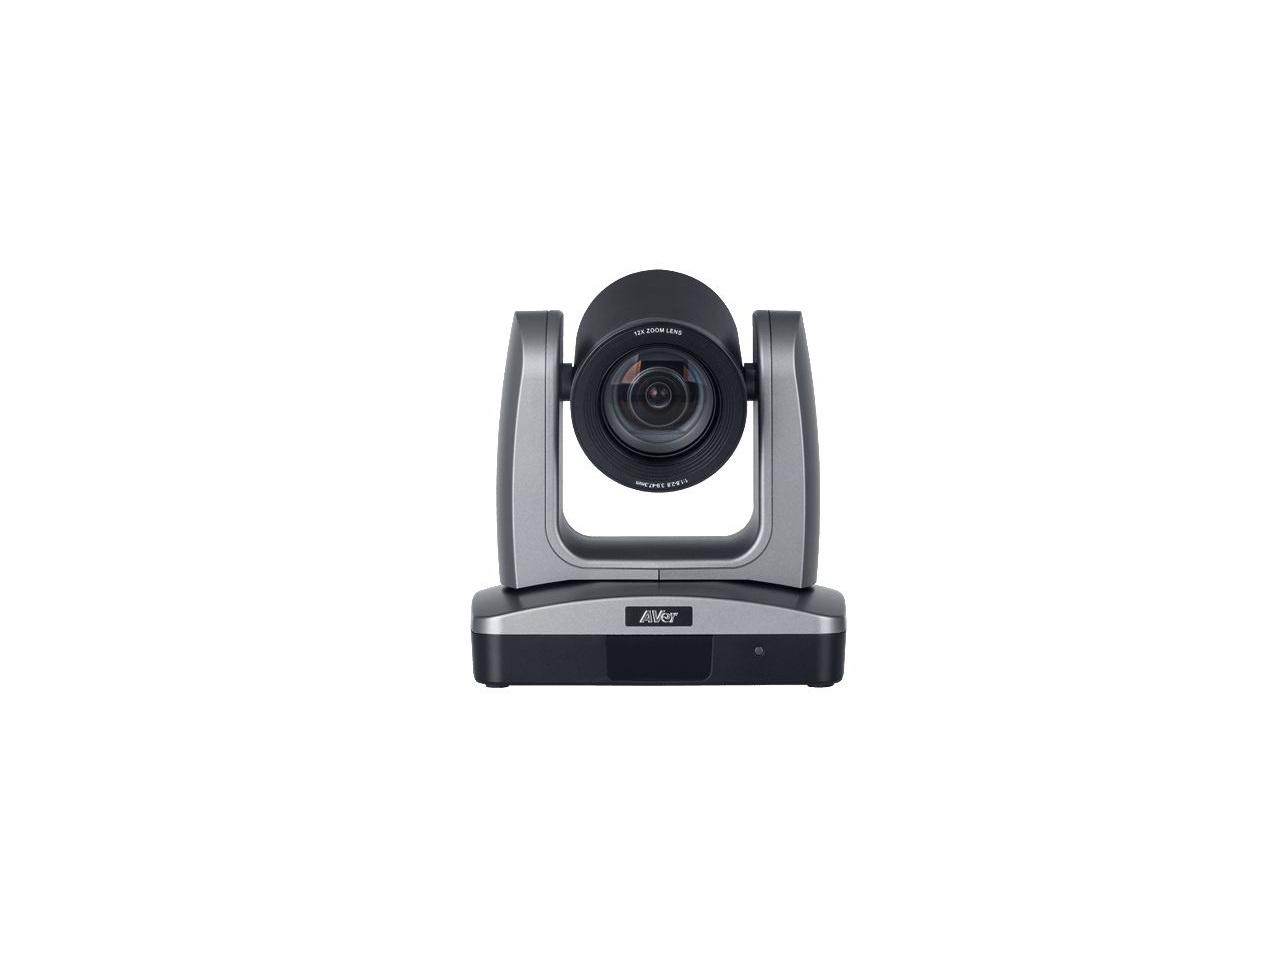 Aver videokonferencia kamera